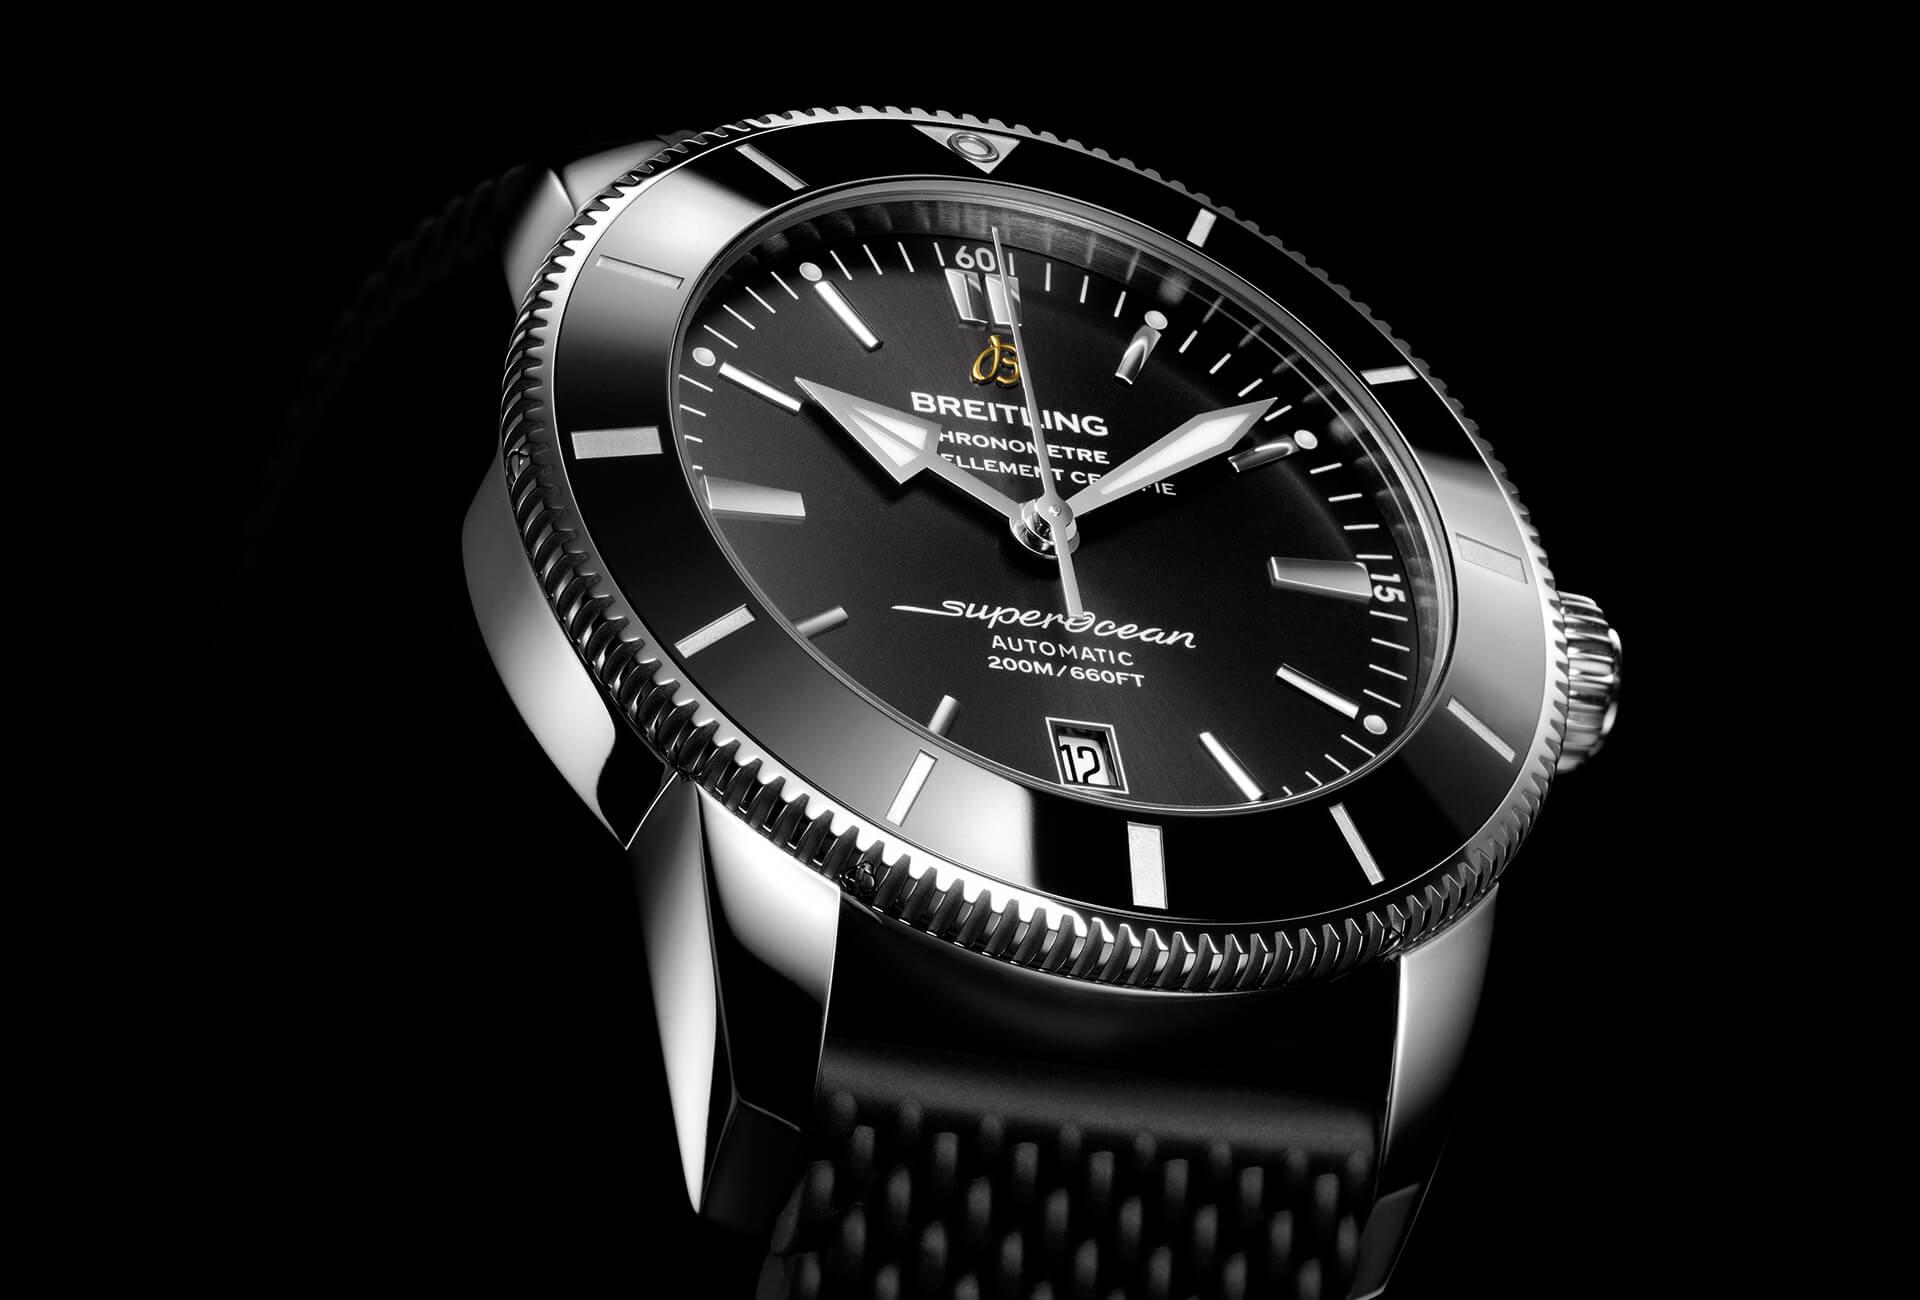 10 montres de luxe pour homme à moins de 6 000 euros – FHH Journal beff1a9640e